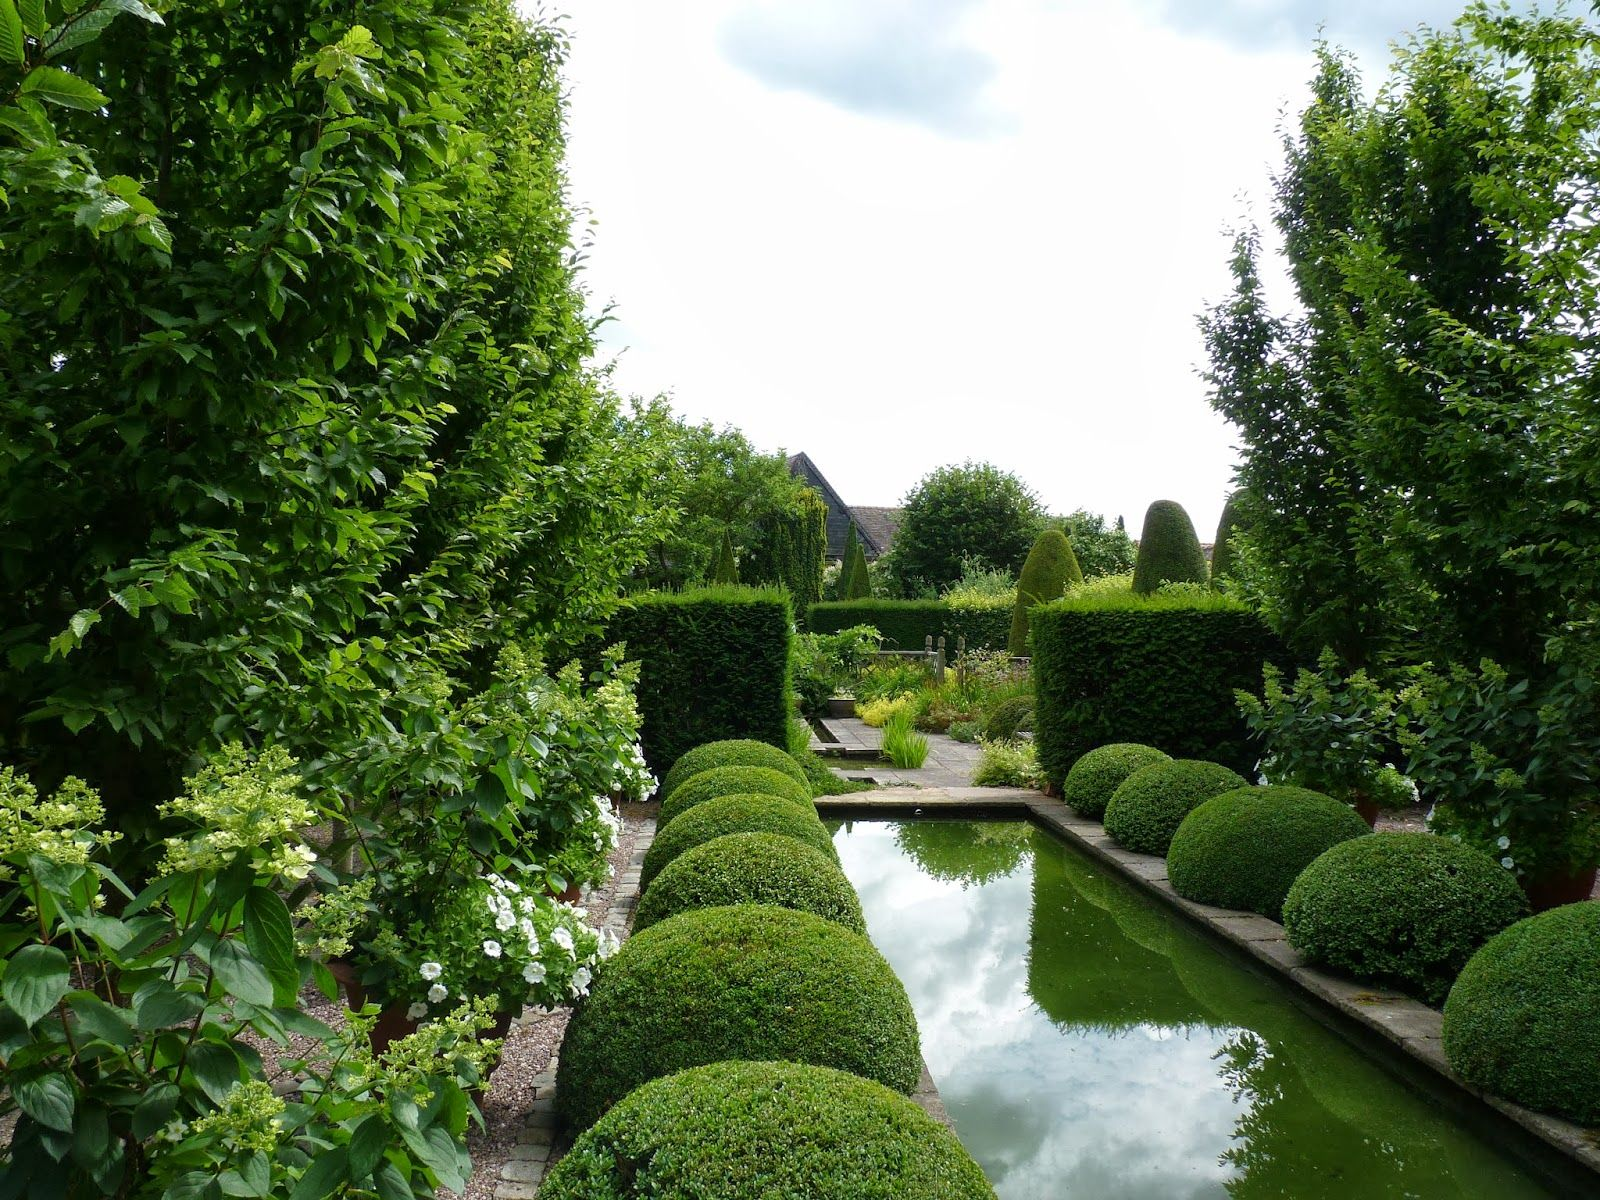 Lesley And John Jenkins Wollerton Old Hall Garden Shropshire Landscape Trees Landscape Architecture Garden Paving